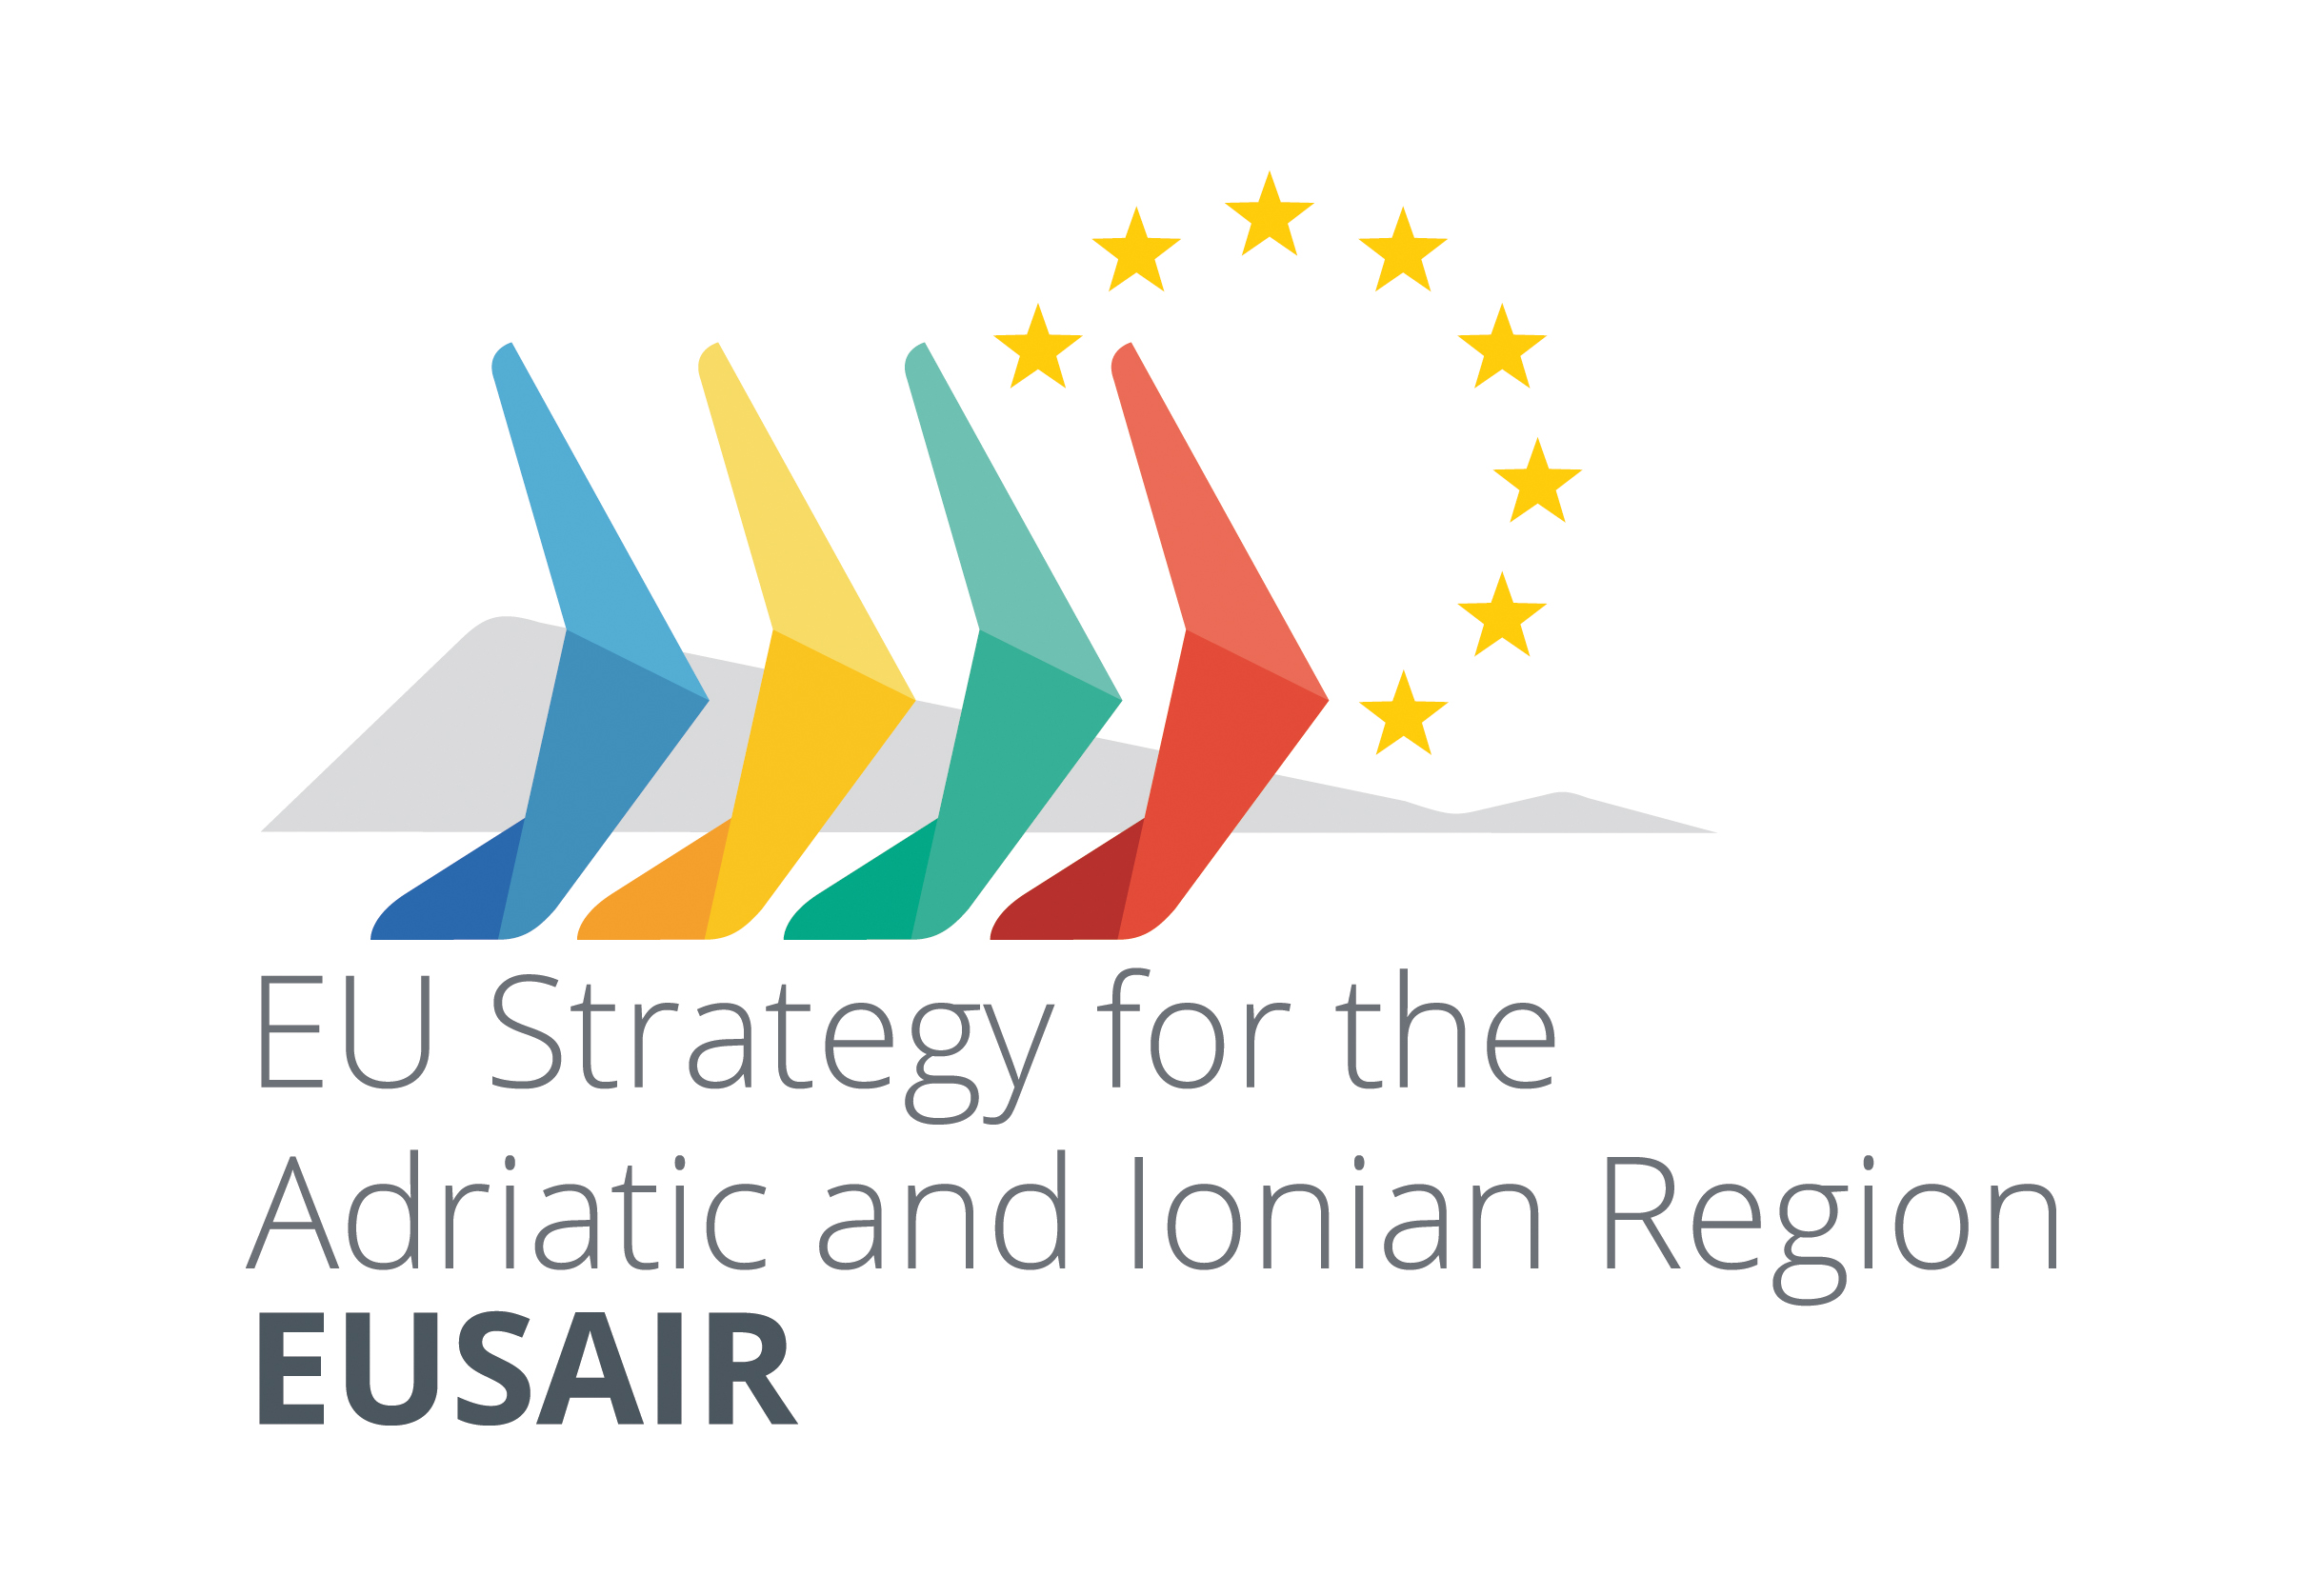 EUSAIR logo. Source: EUSAIR website